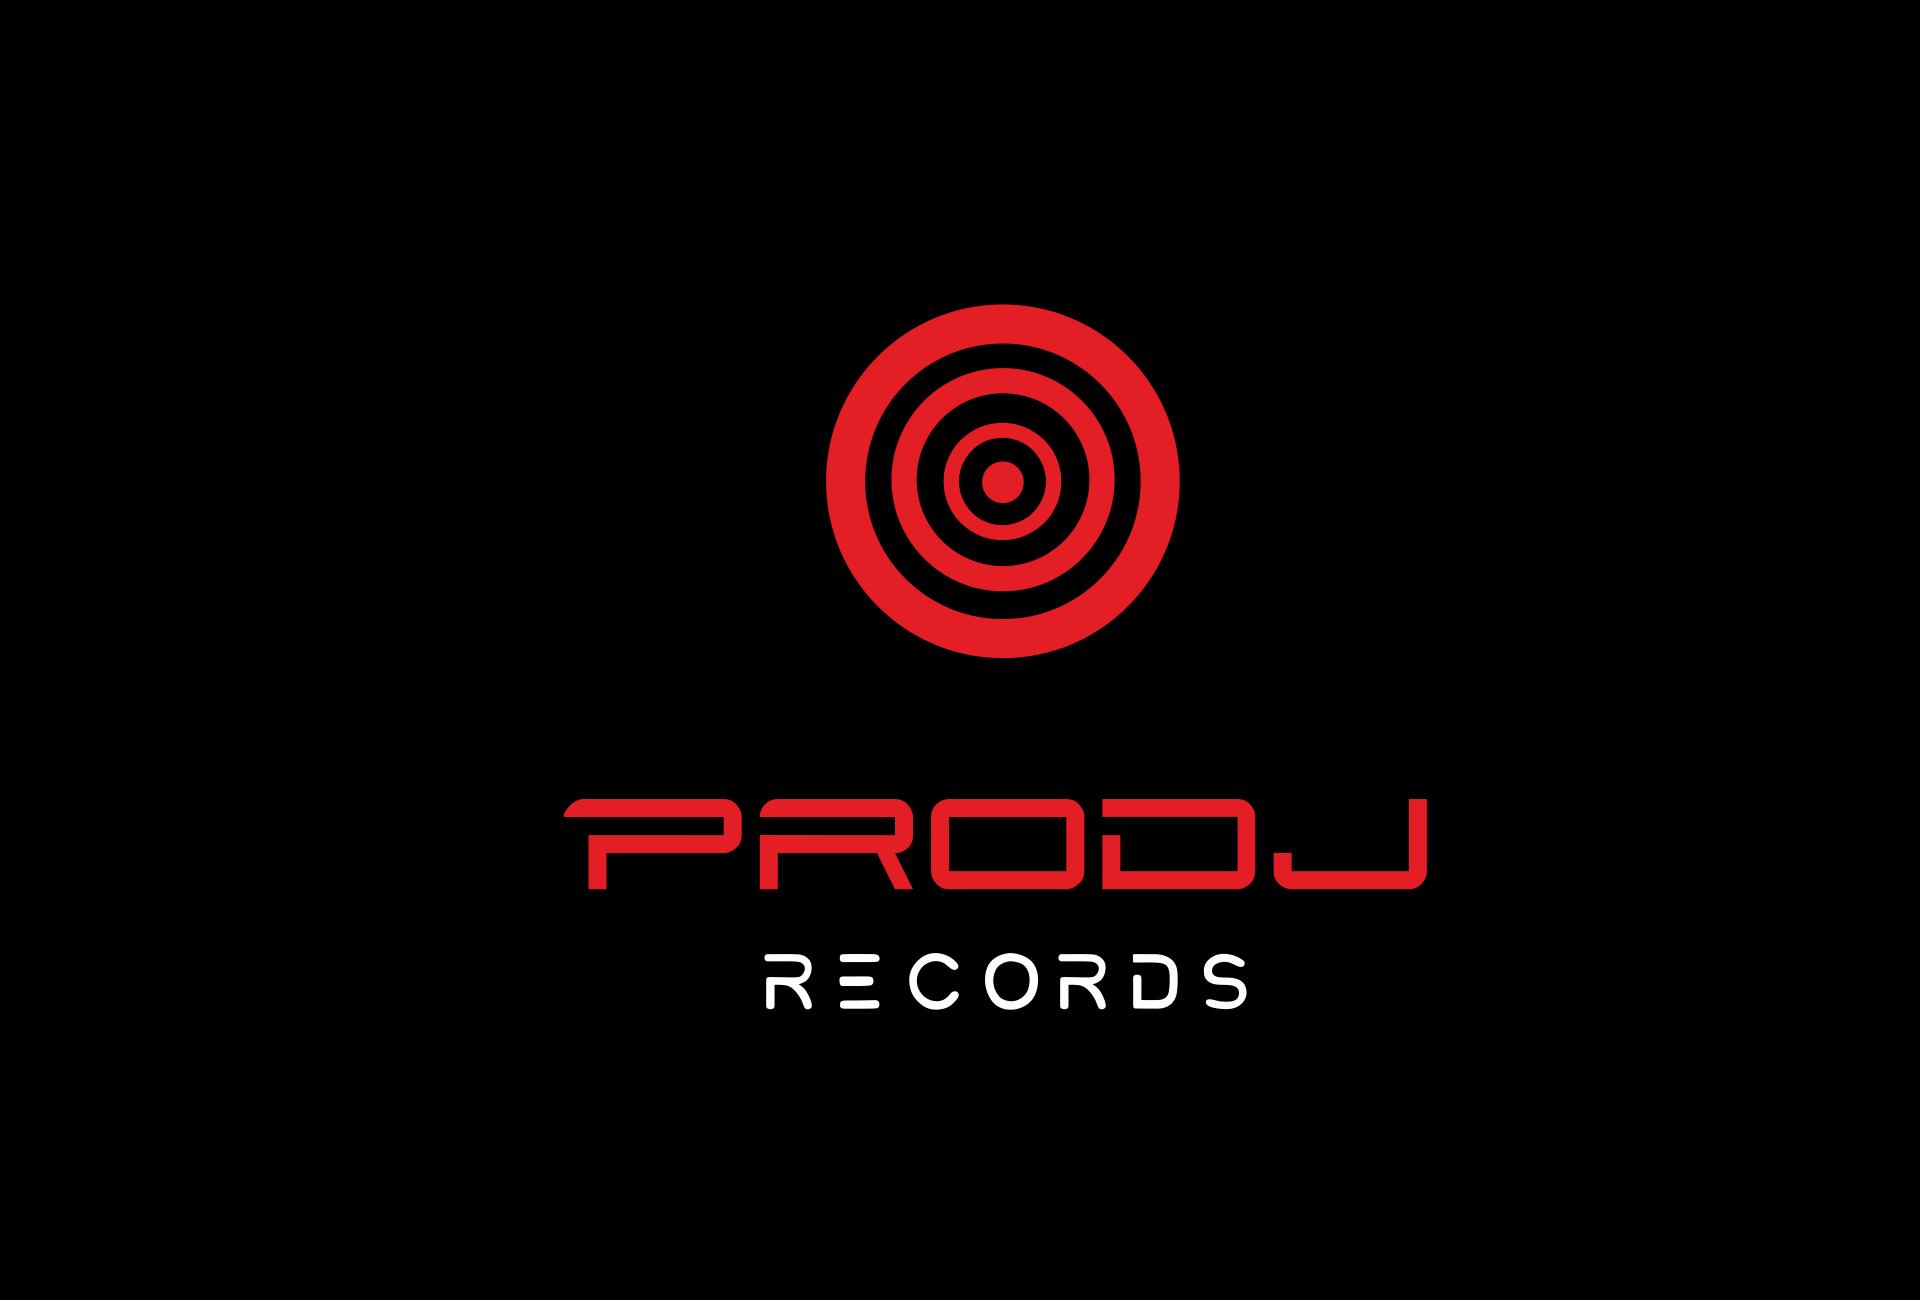 prodj_records_sign_3